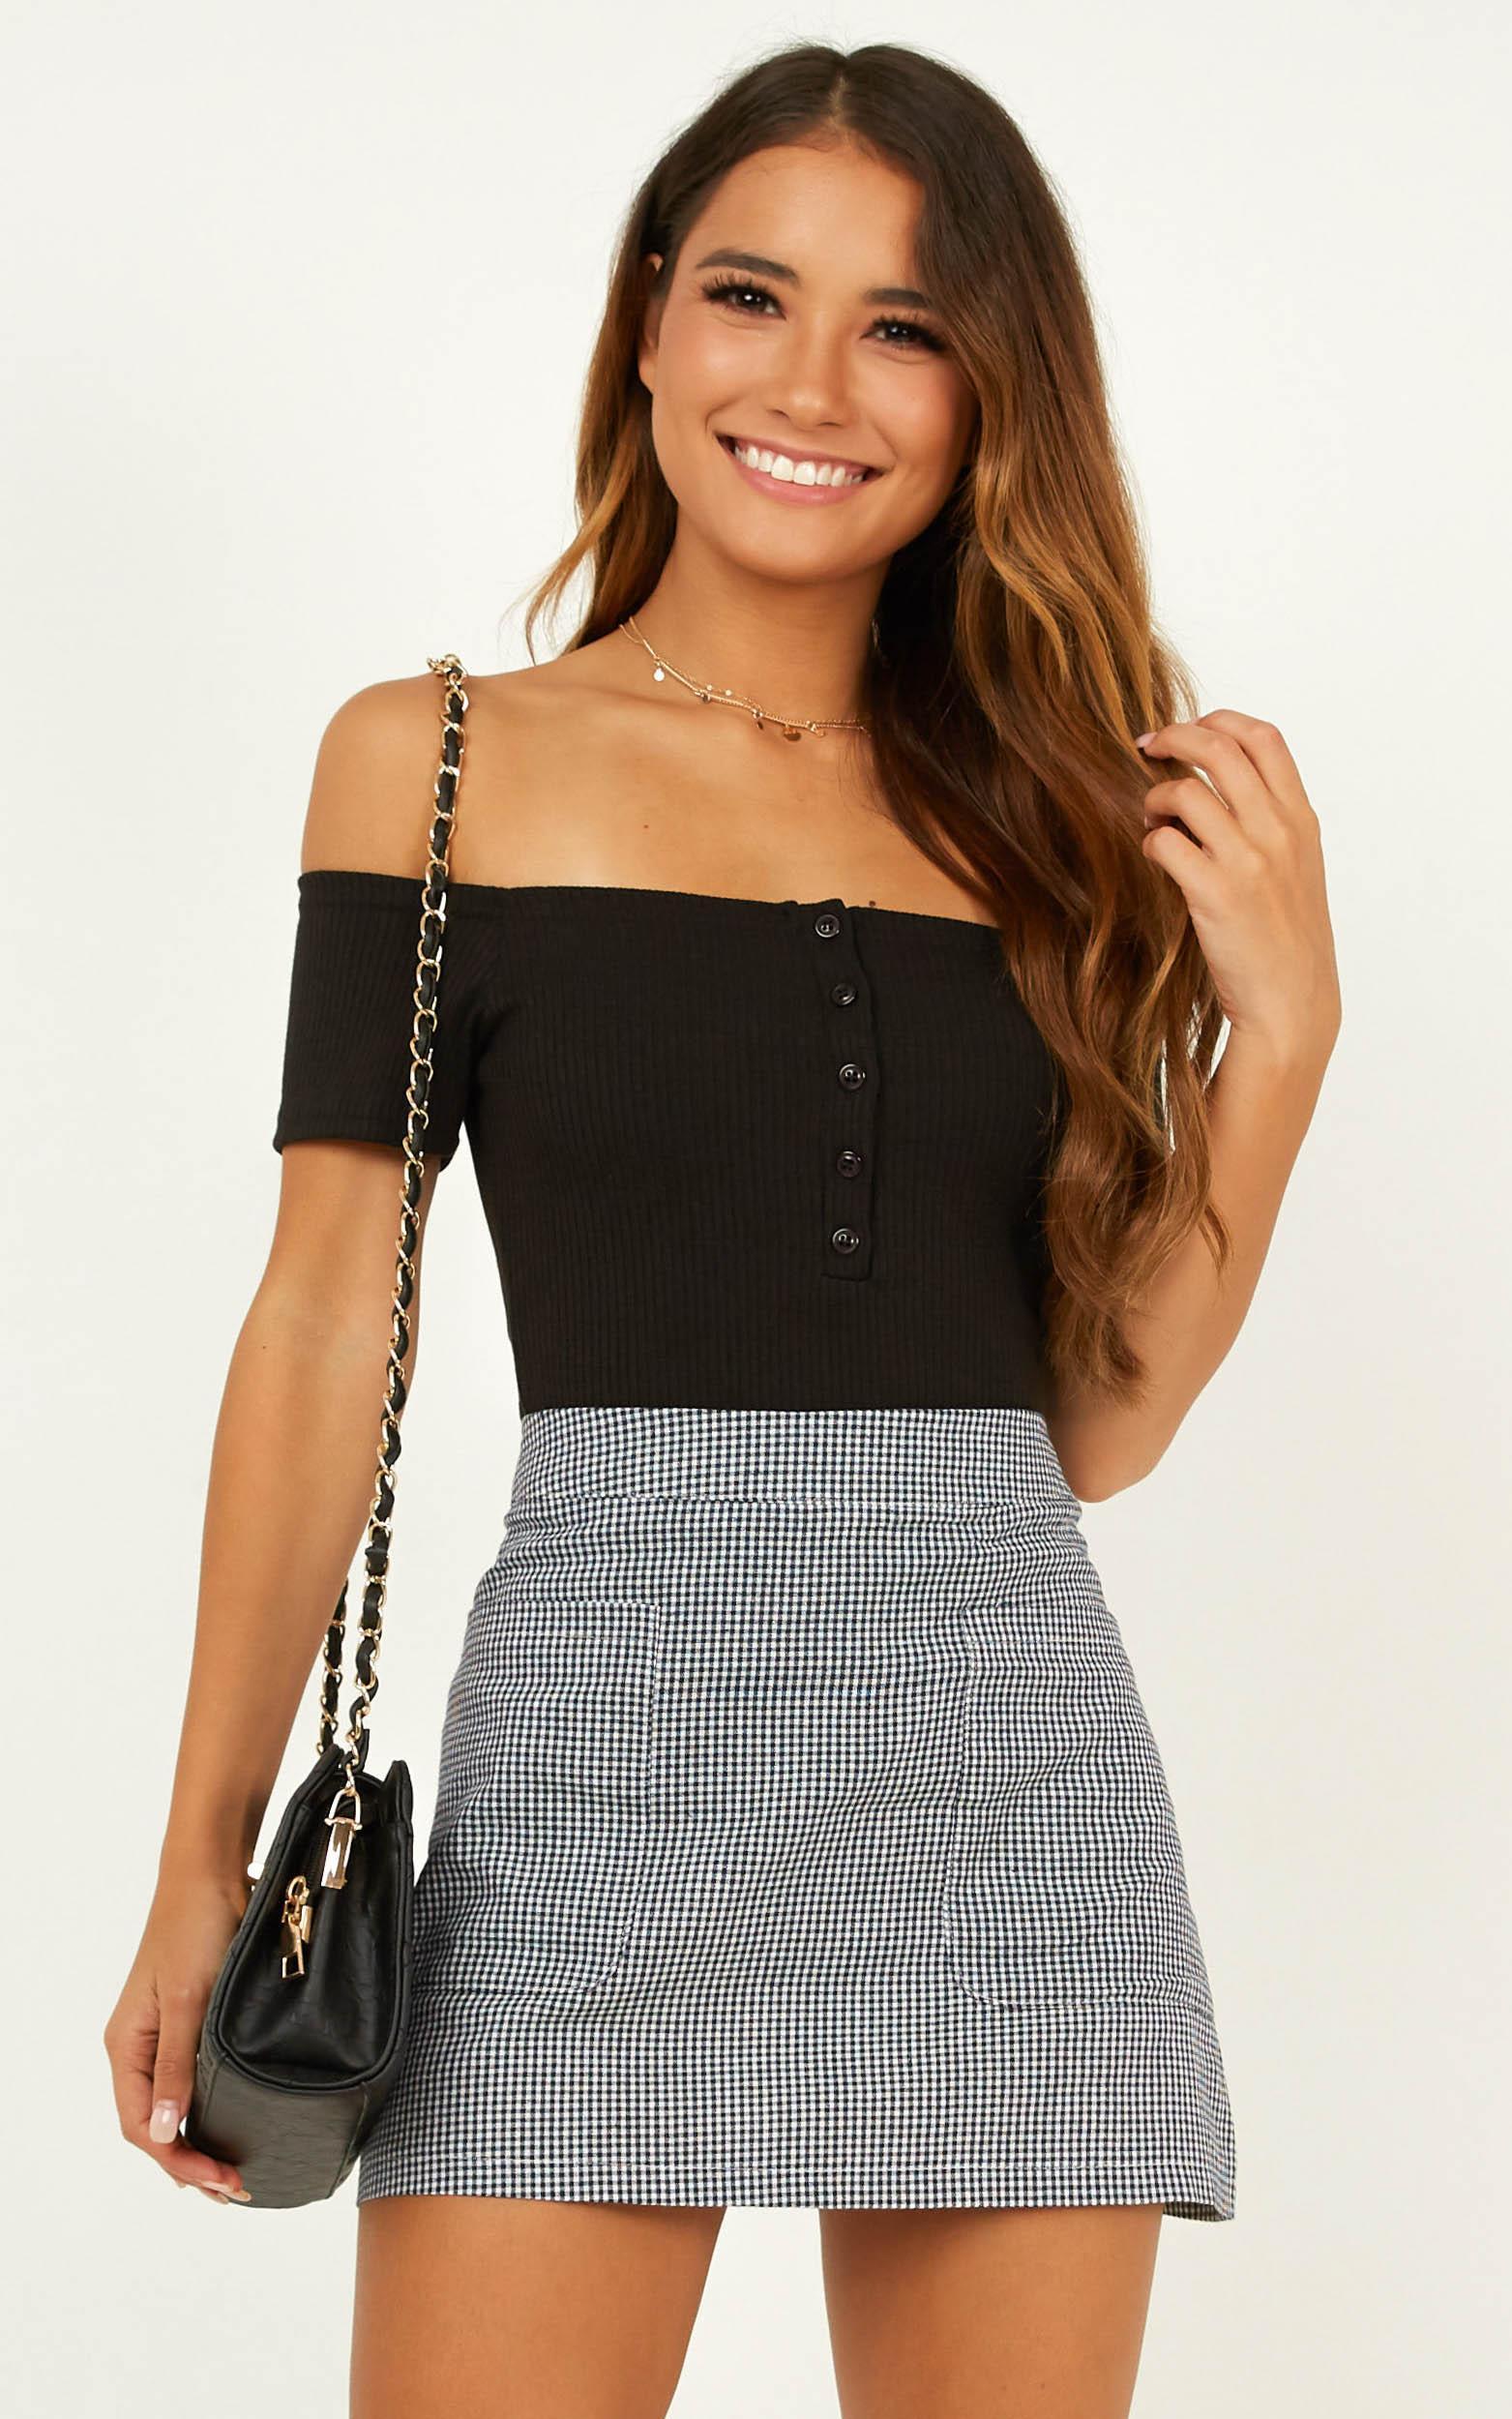 Lean On Me Skirt In Black Gingham - 4 (XXS), Black, hi-res image number null